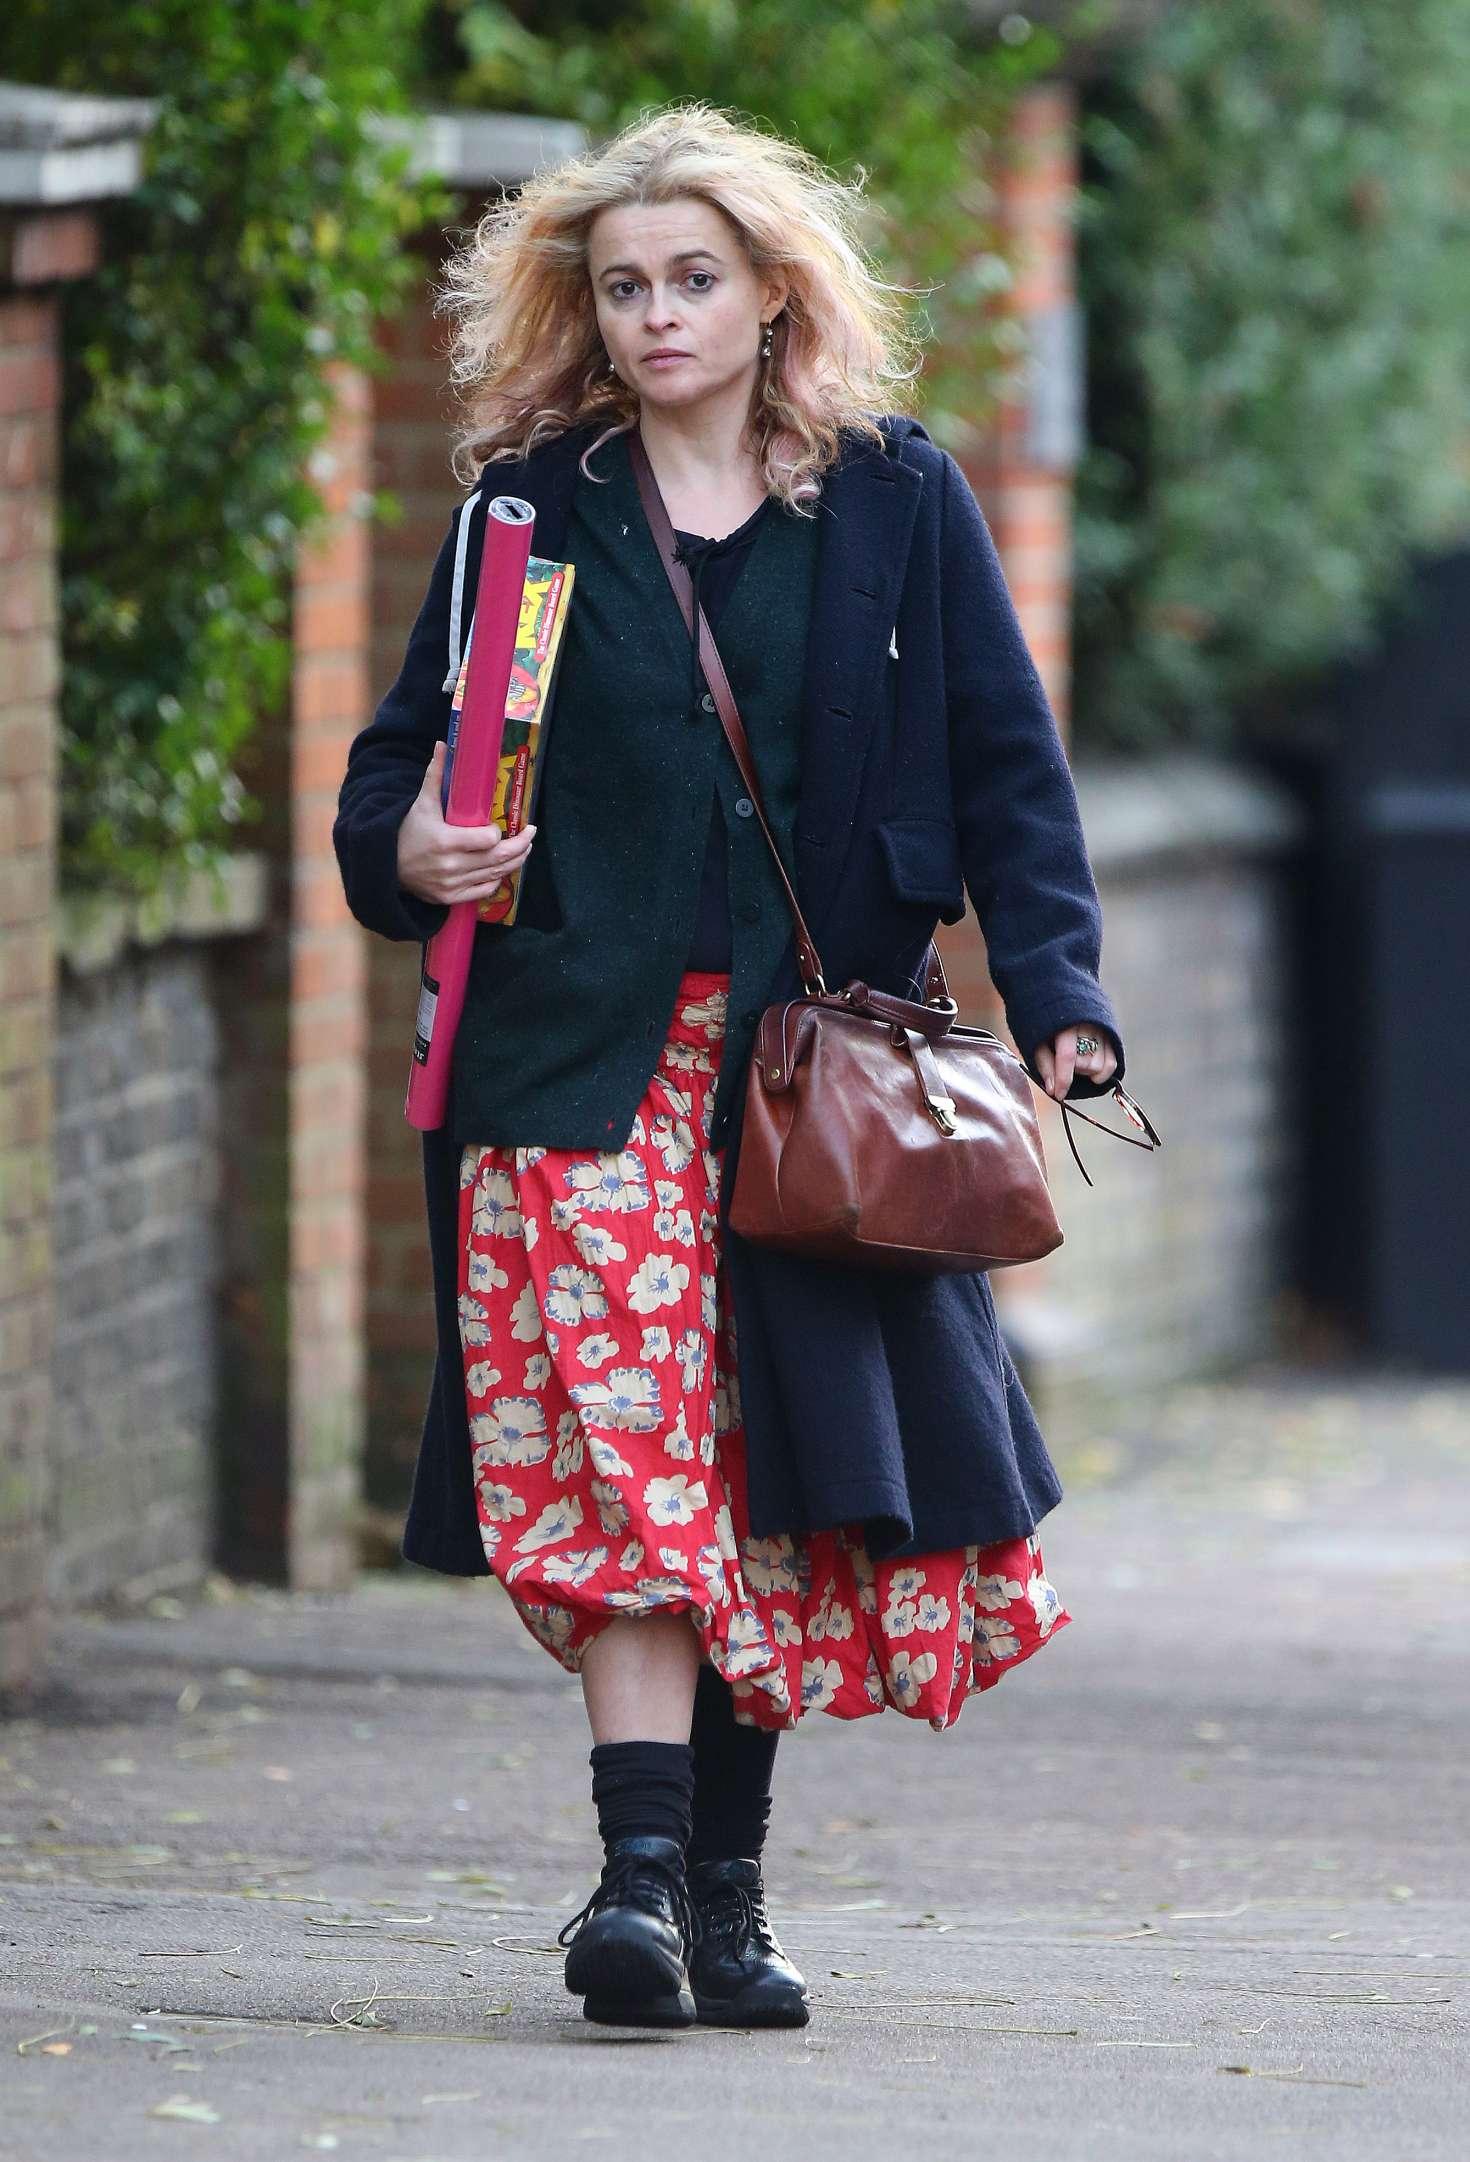 Helena Bonham Carter 2016 : Helena Bonham Carter: Christmas Shopping in London -06